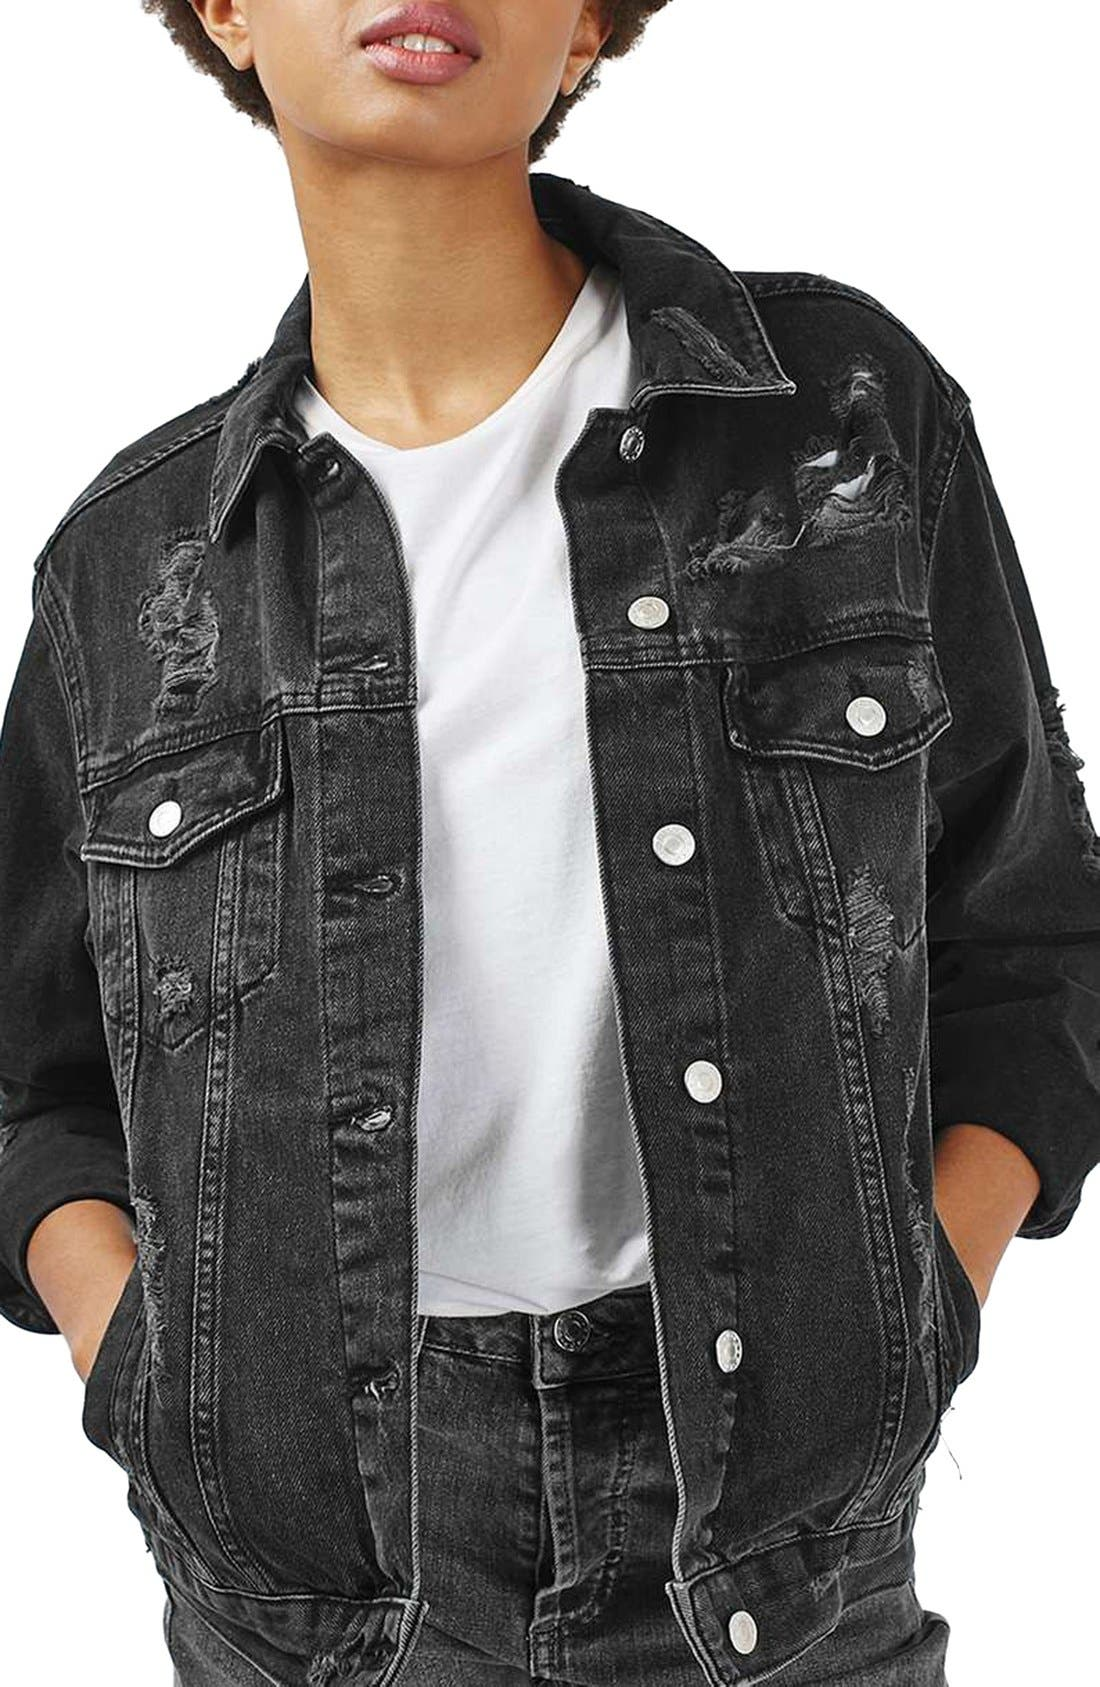 Alternate Image 1 Selected - Topshop Moto Ripped Oversize Denim Jacket